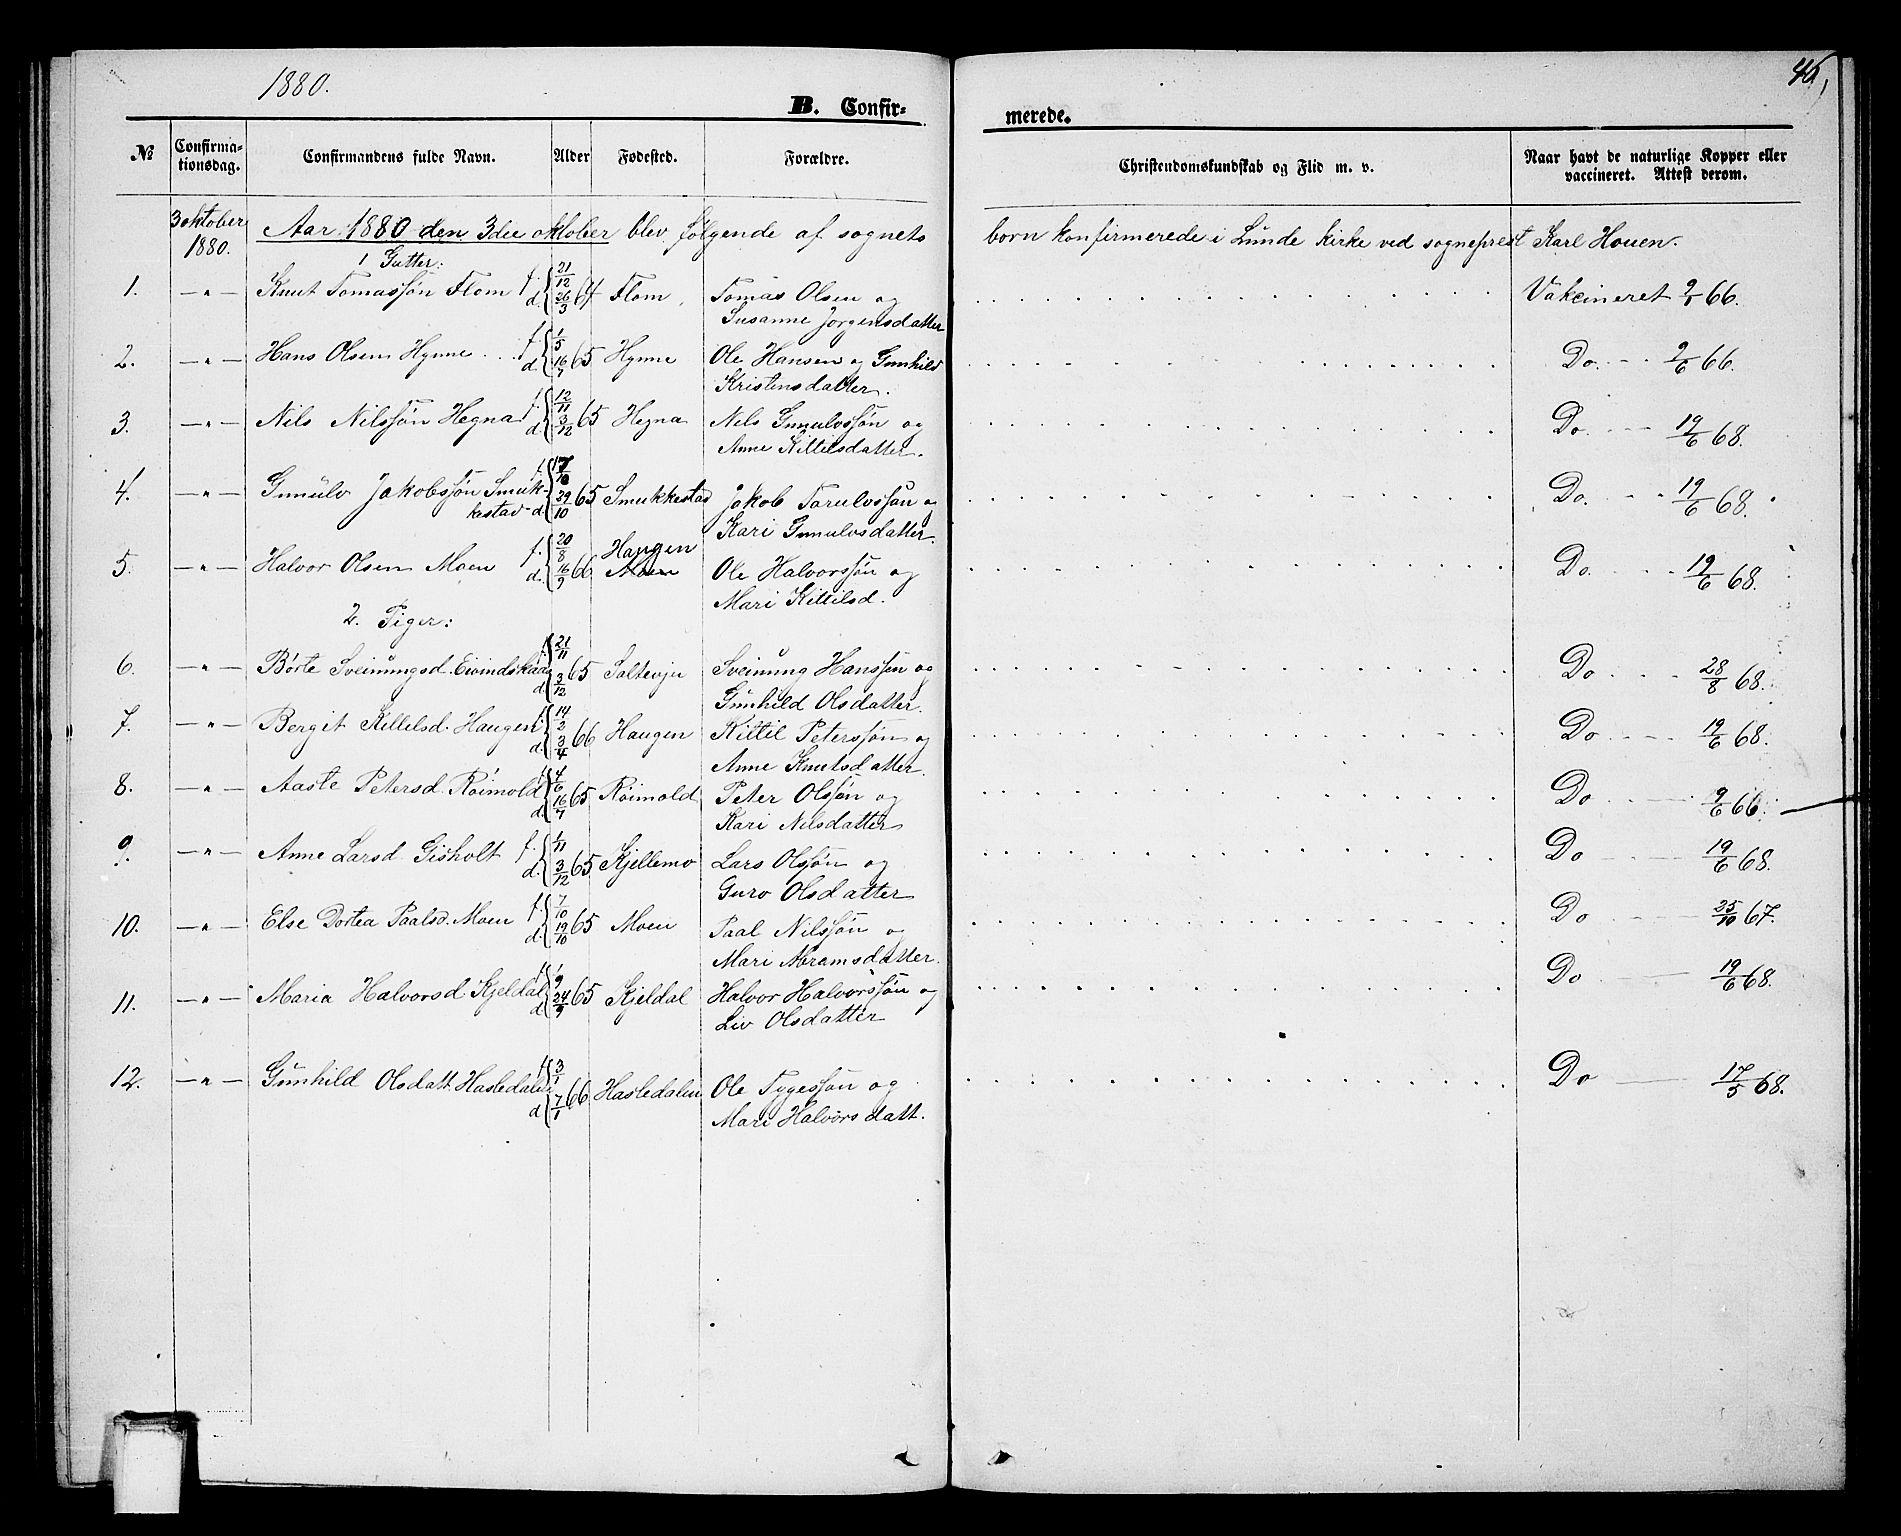 SAKO, Lunde kirkebøker, G/Gb/L0001: Klokkerbok nr. II 1, 1866-1887, s. 46